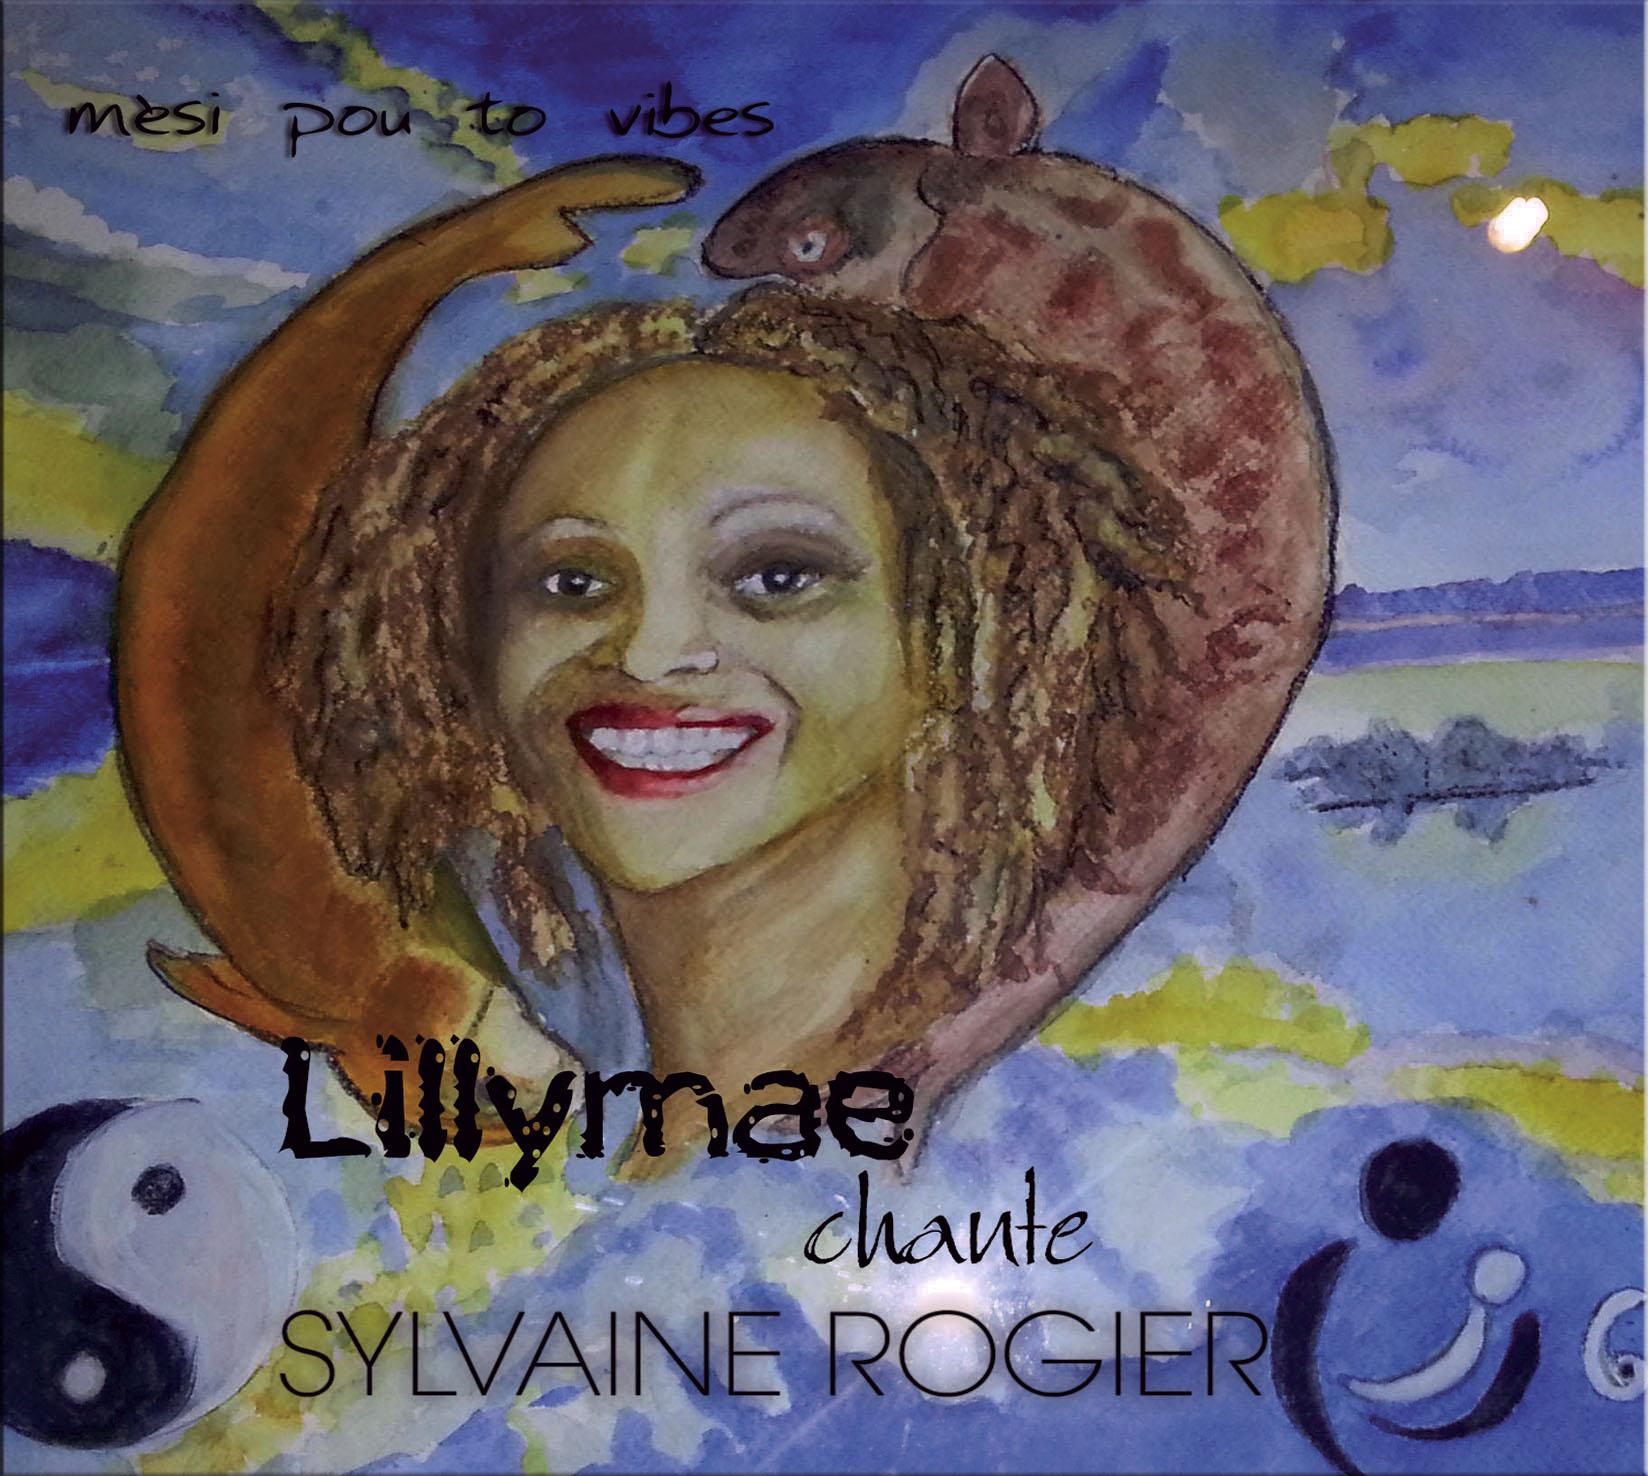 Sylvaine_Rogier_Mèsi_pou_to_vibe